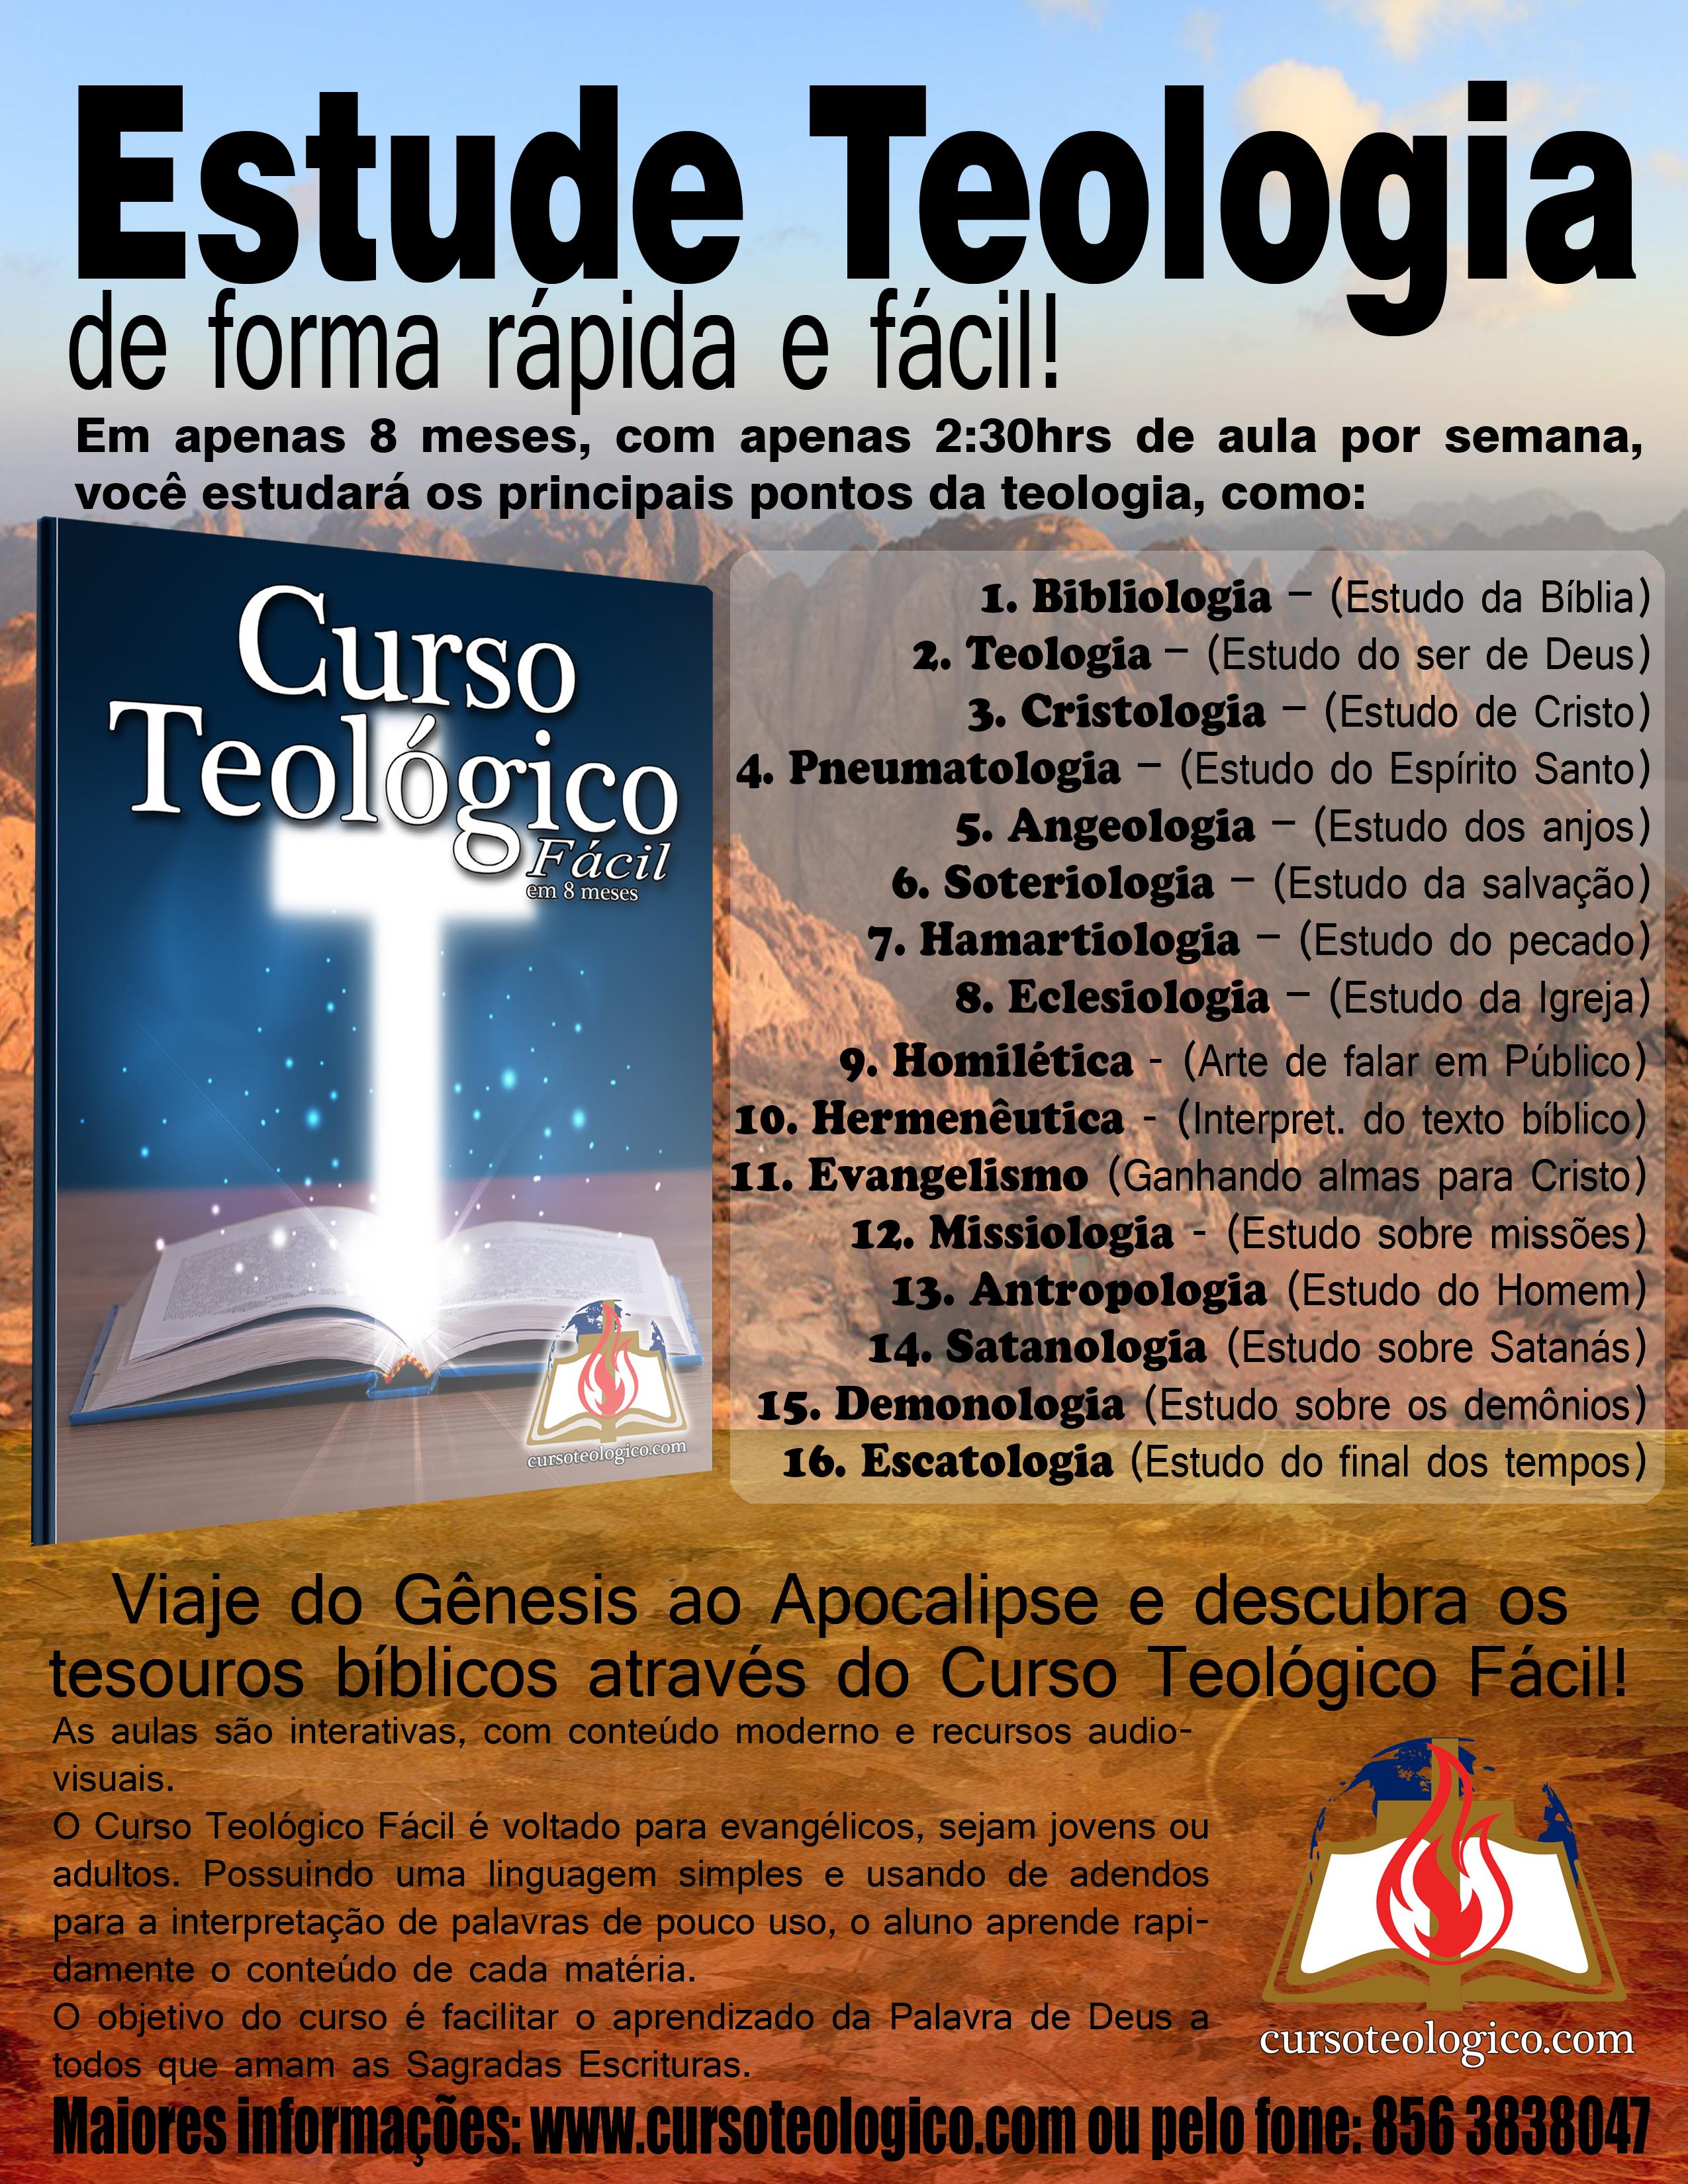 Curso Teológico Fácil - Missiologia e Antropologia